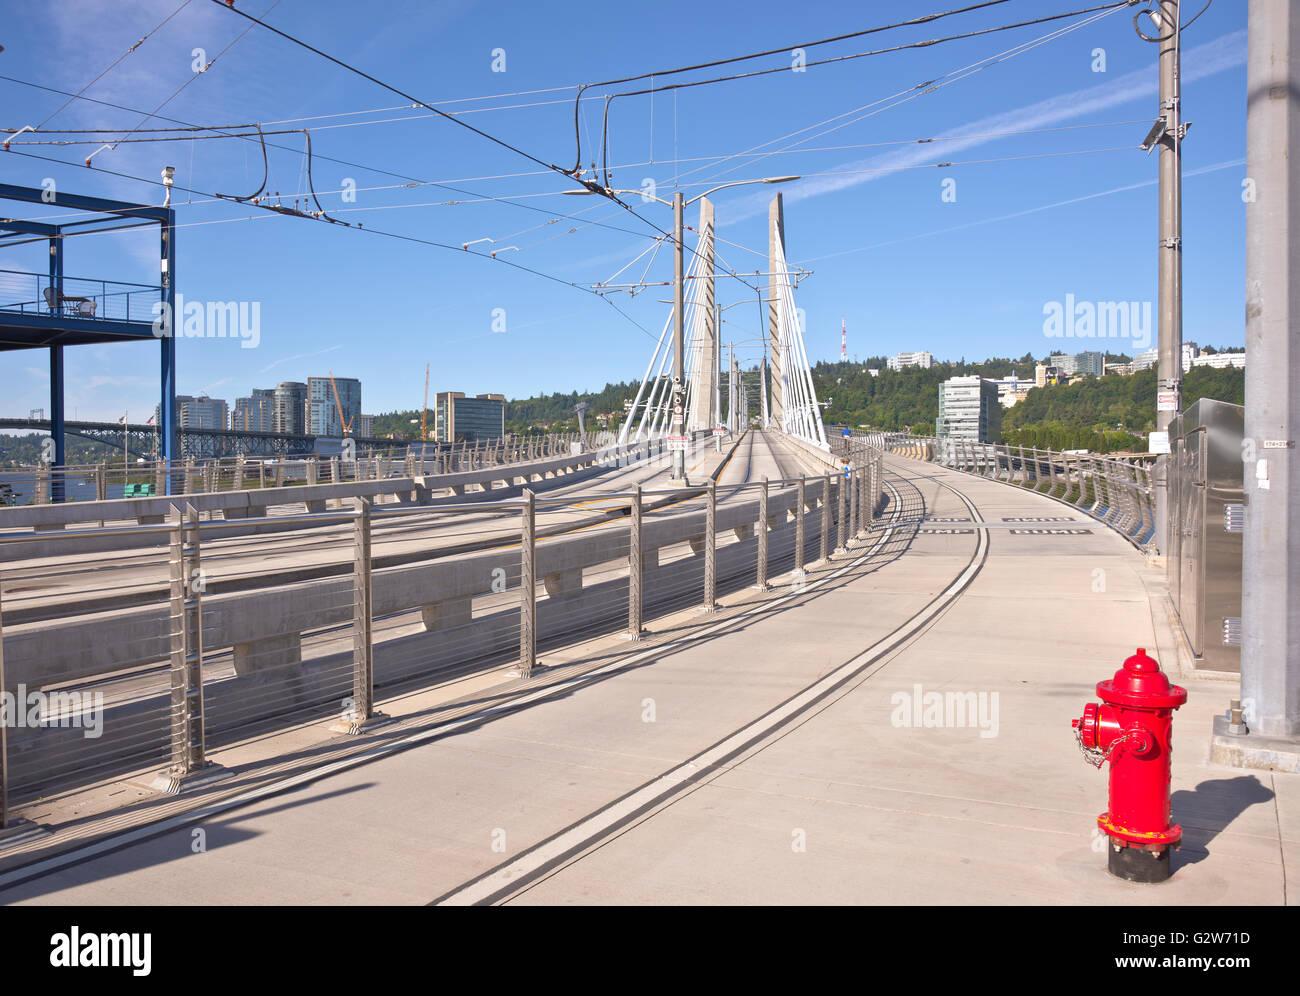 Tillikum crossing bridge and railtracks Portland Oregon. - Stock Image